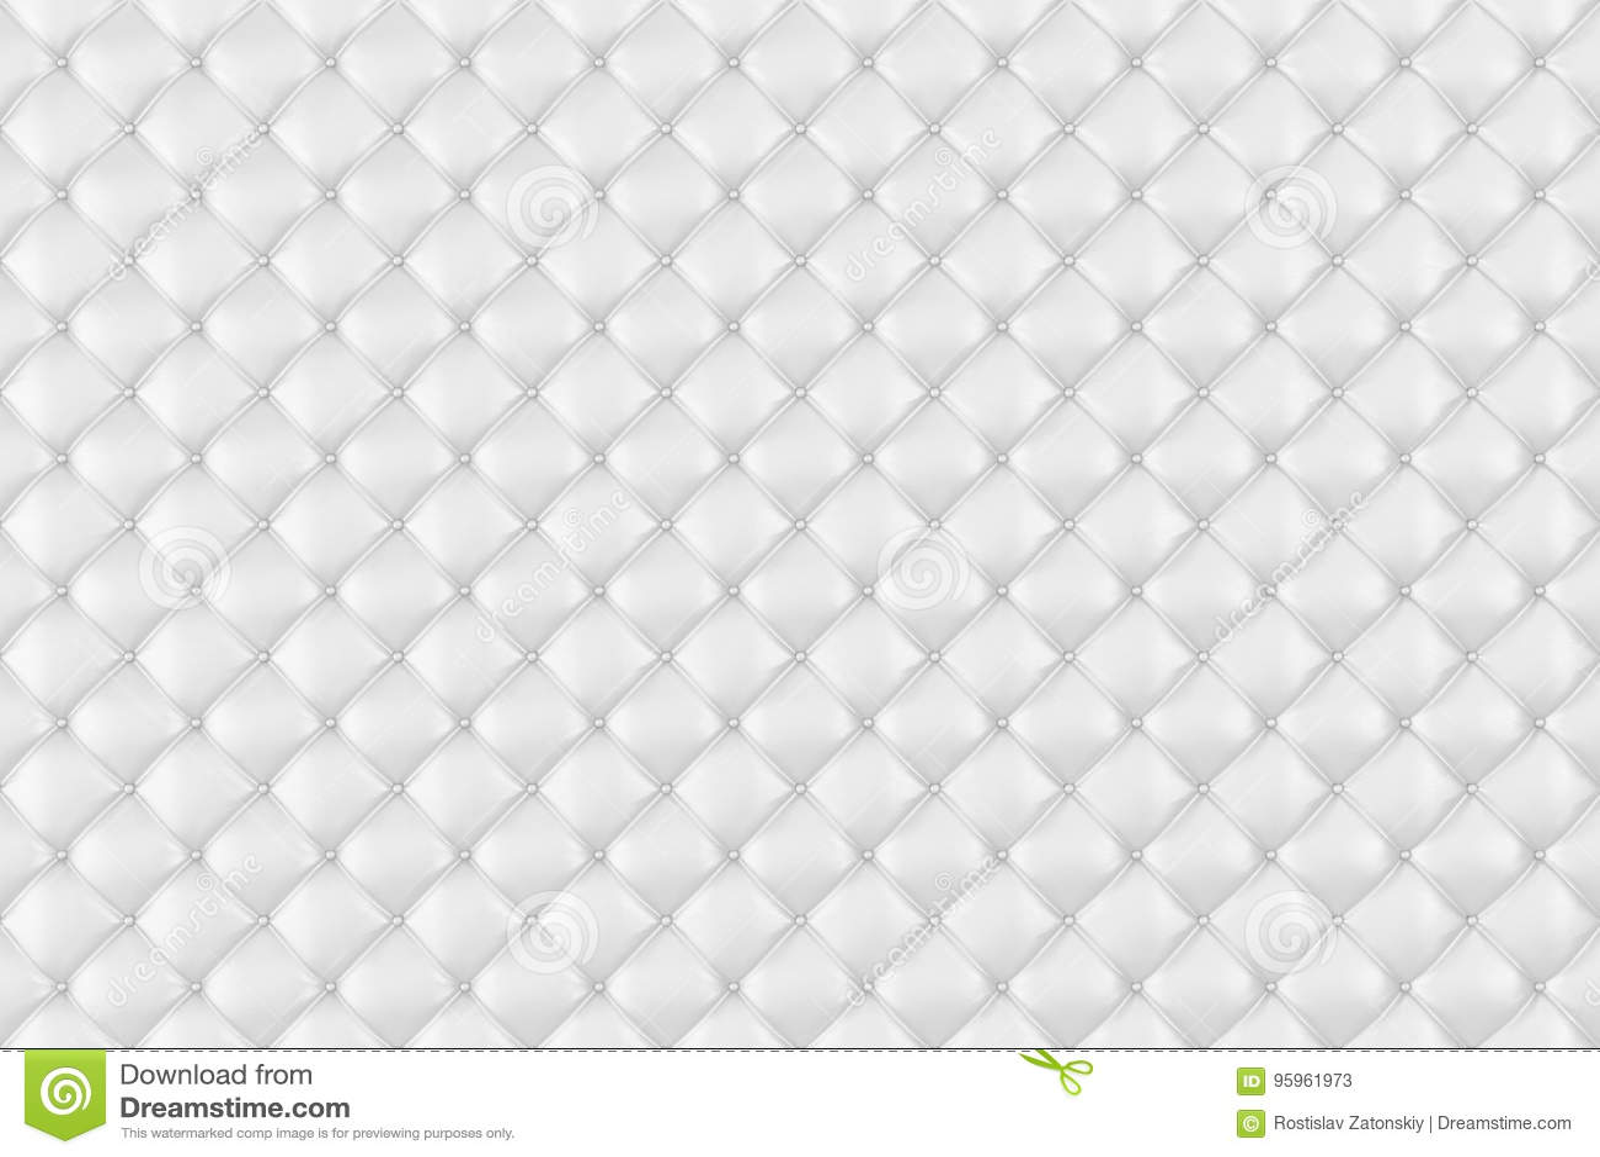 Estofamento De Couro Sofa Background Sofa Luxuoso Branco